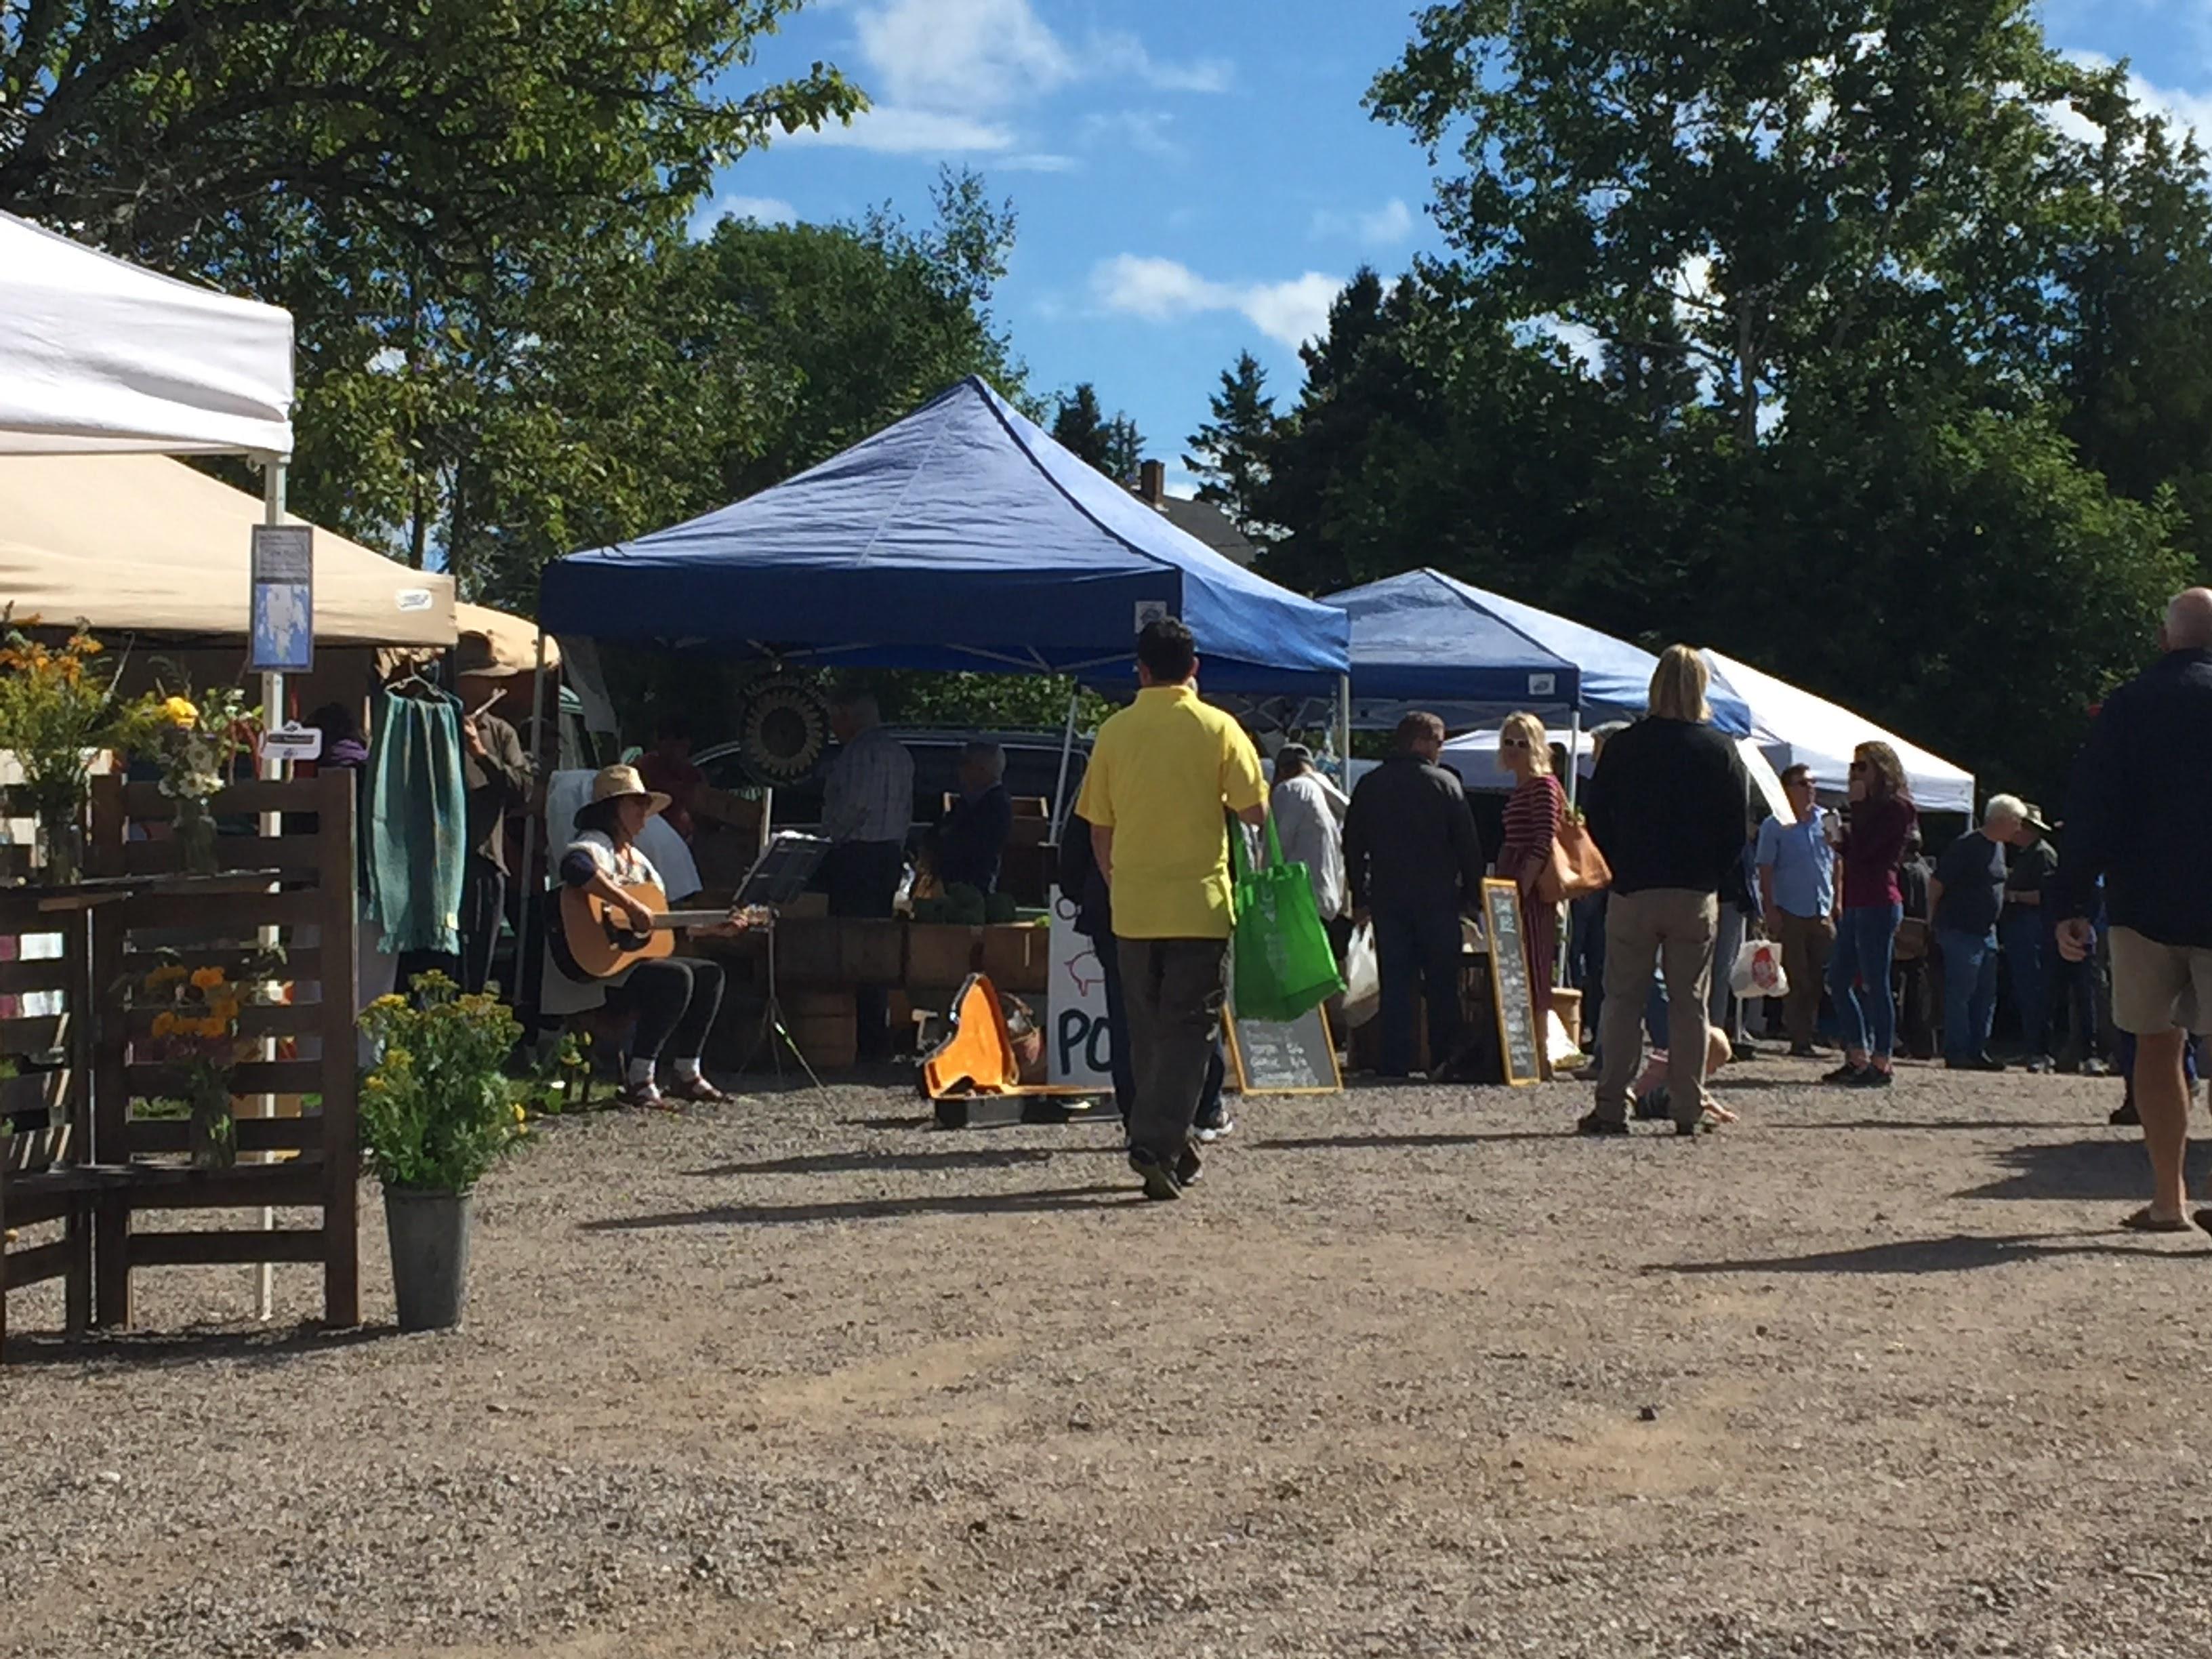 2017-07-25 Scoodic - Winter Harbor Farmers Market 01